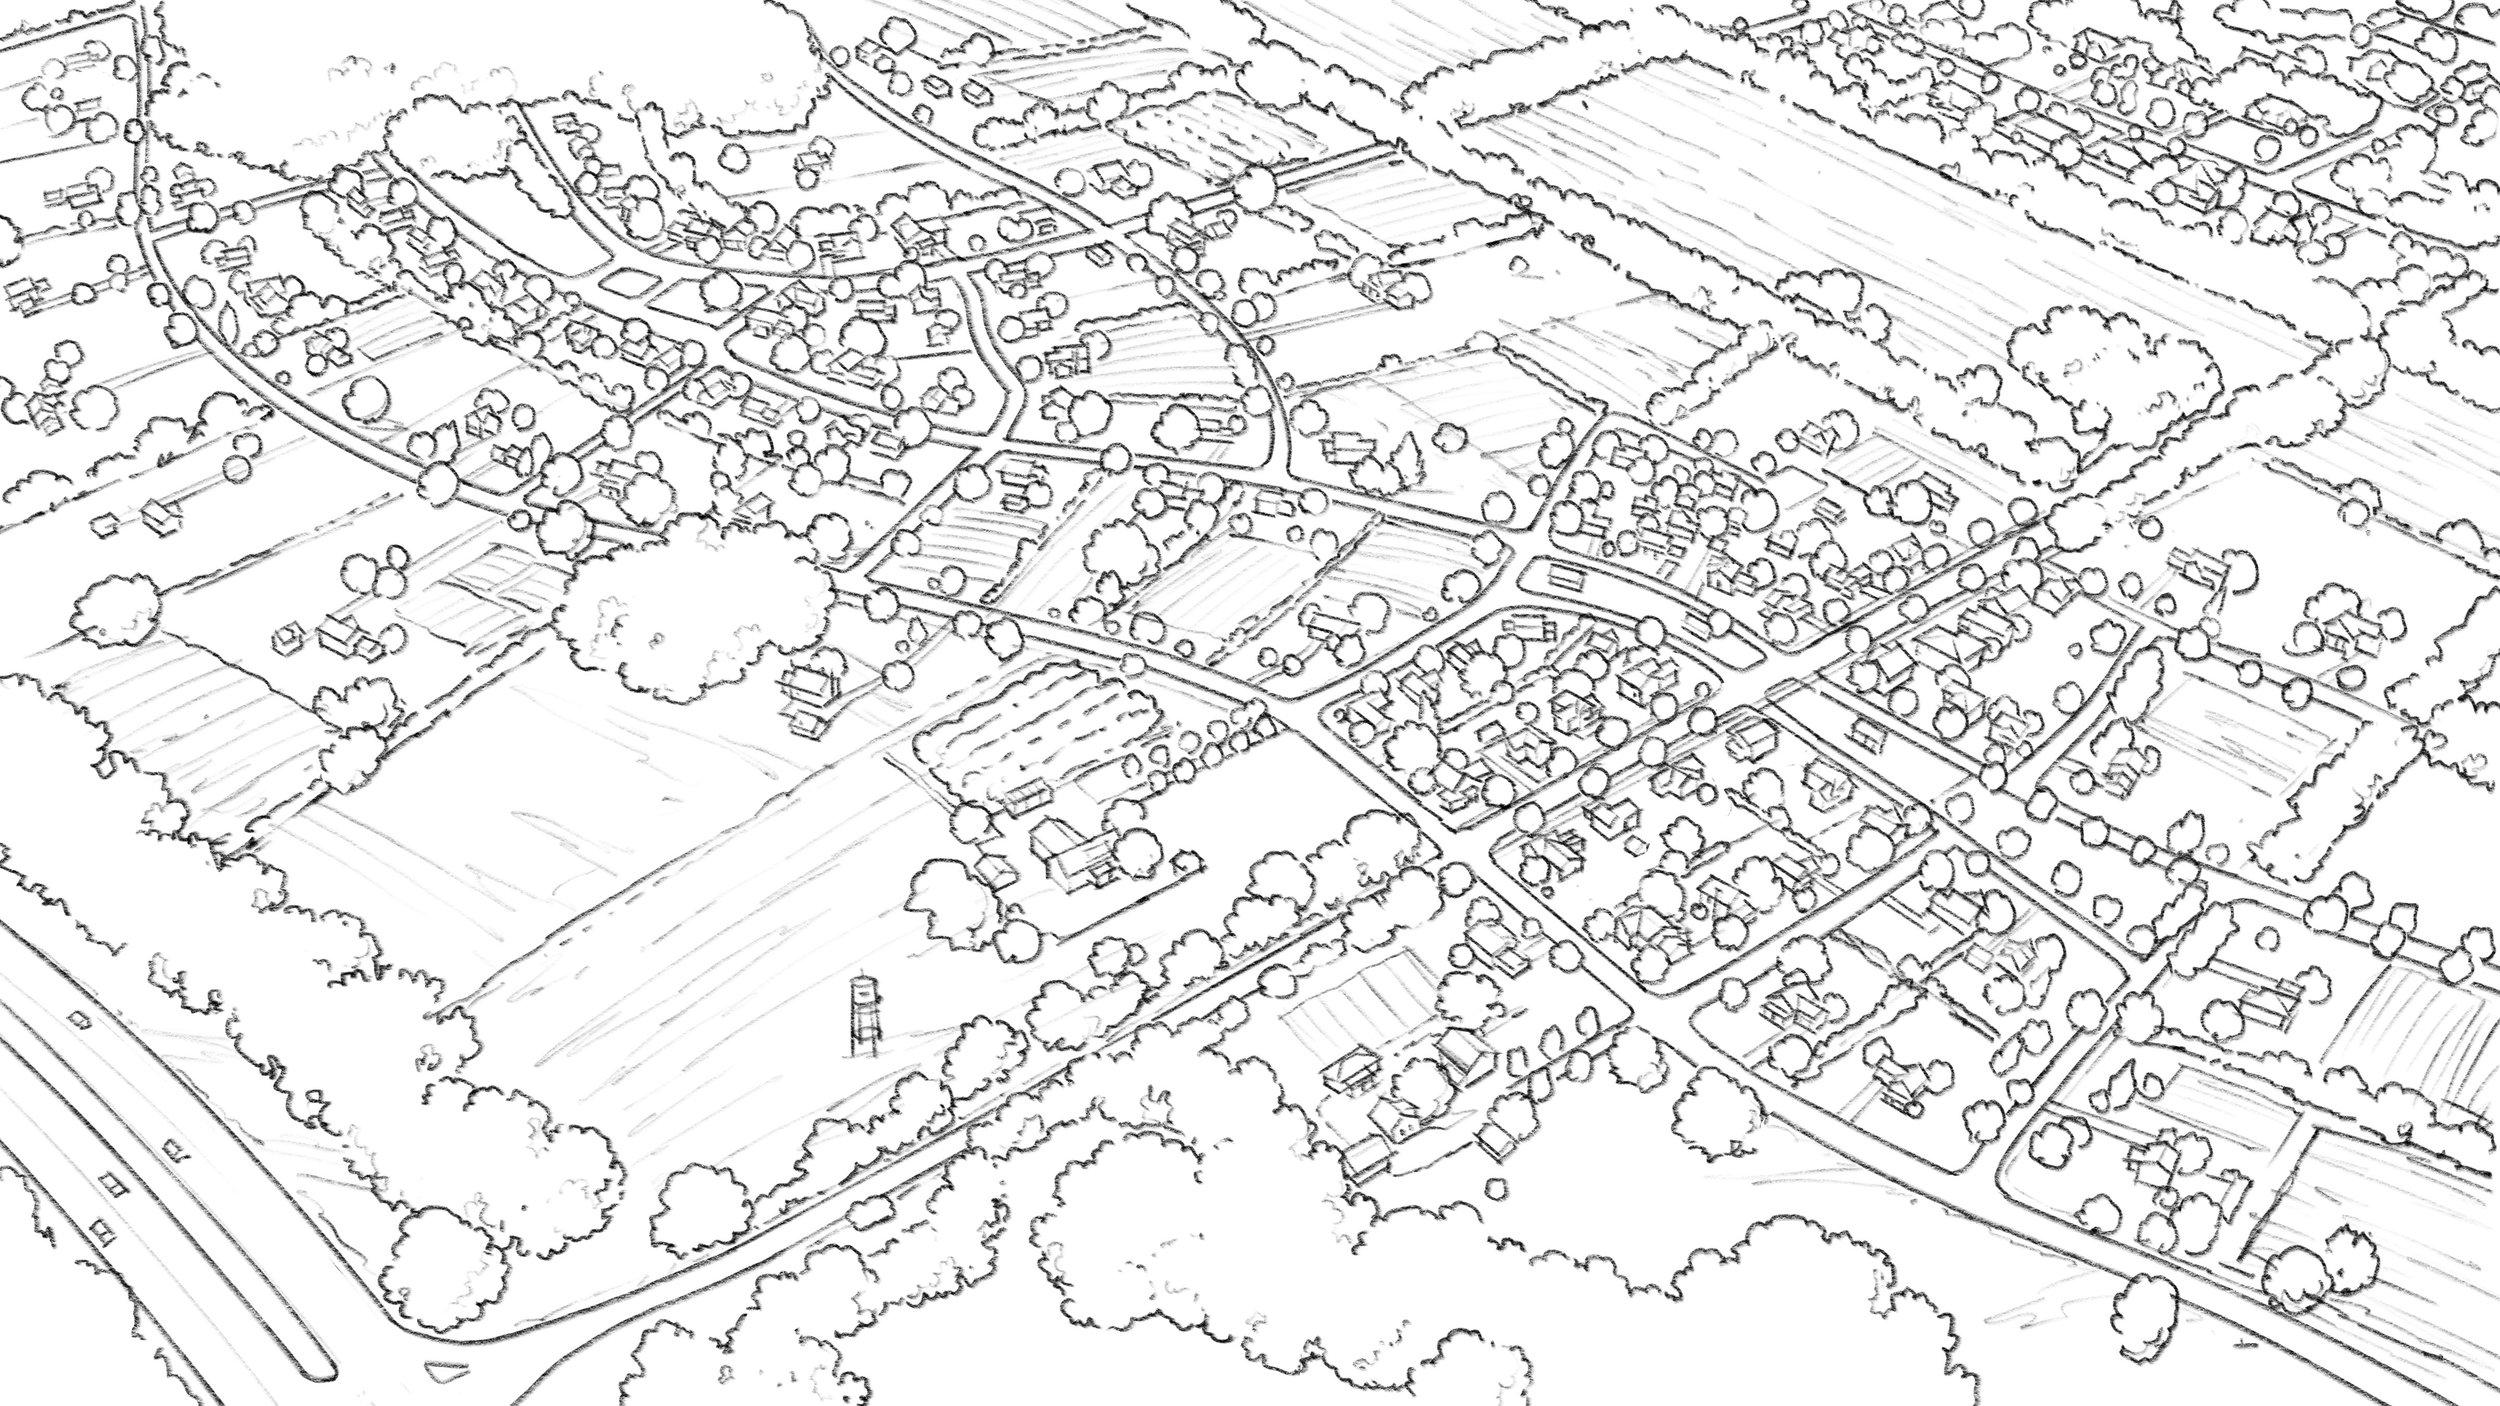 19027-TPUDC_Franklin_DelRIo_Aerial01-3_line.jpg